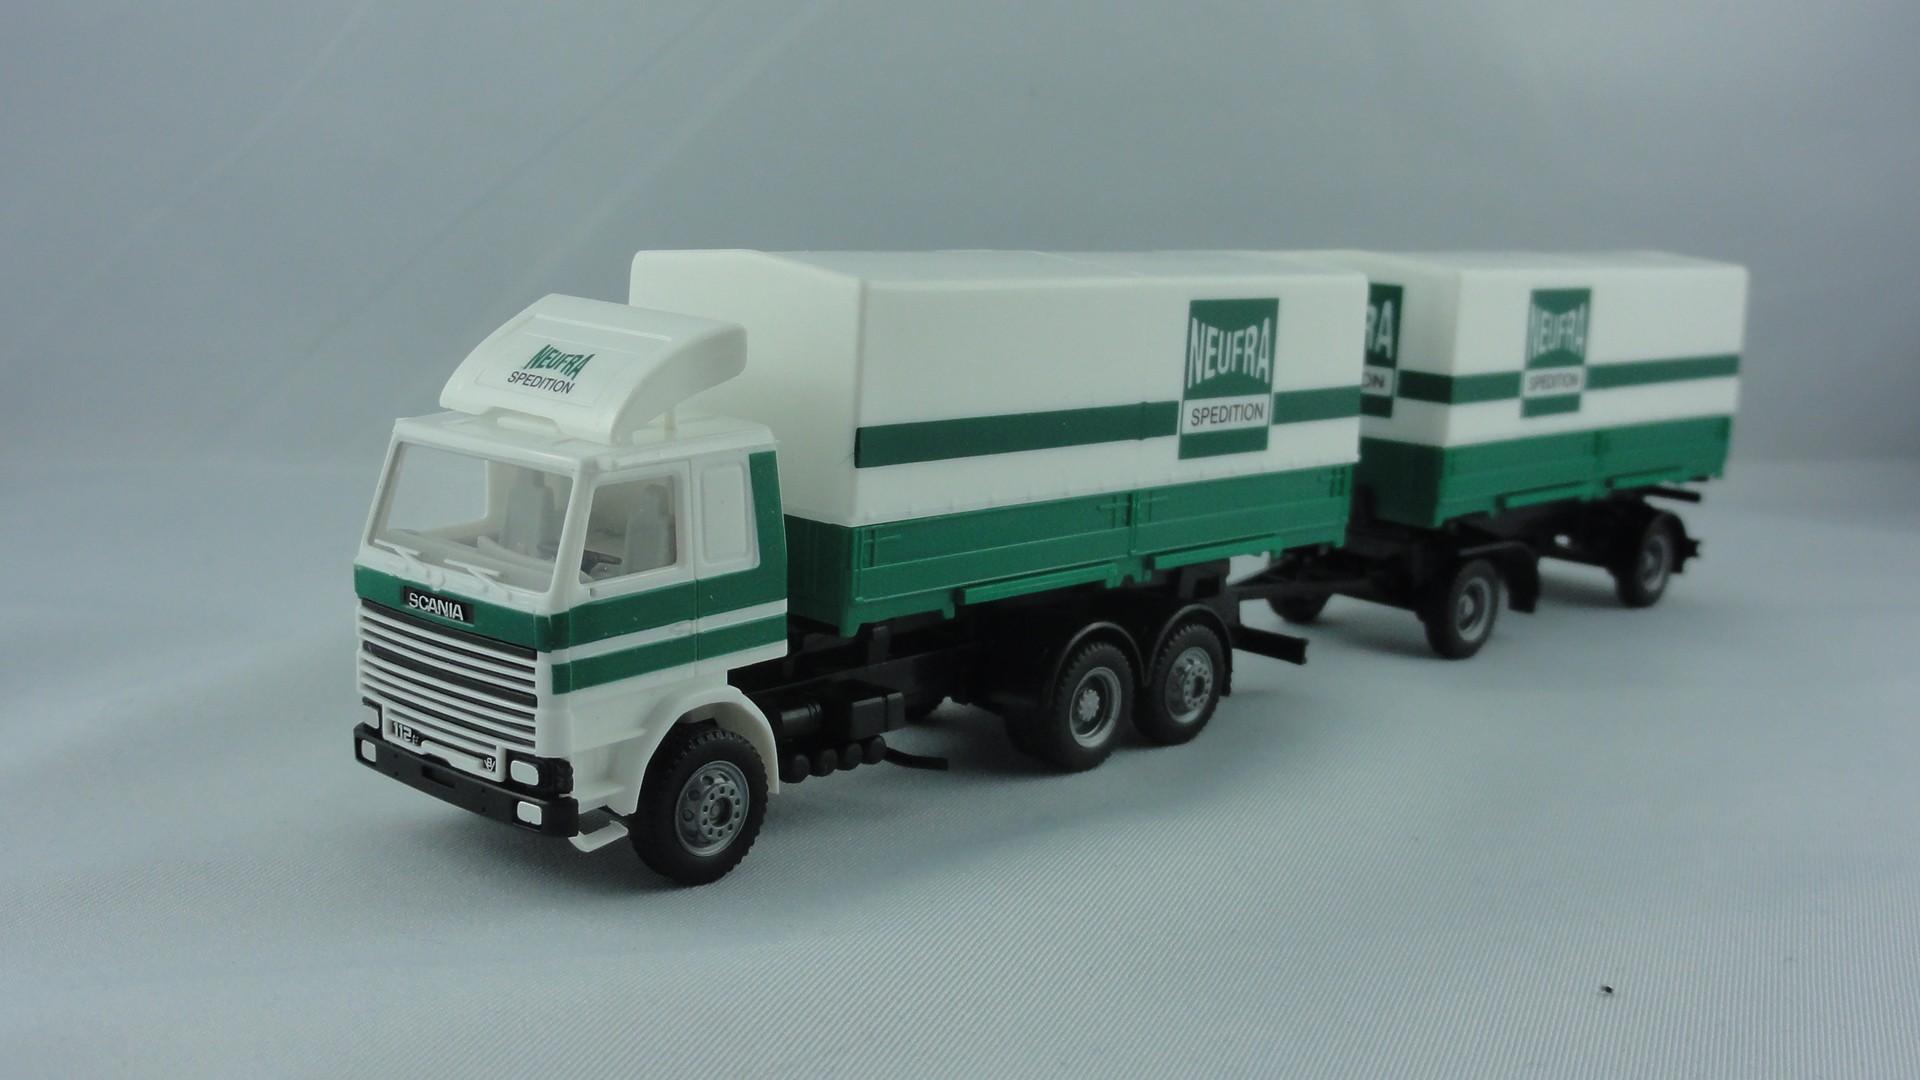 Herpa Scania Planenhängerzug NEUFRA Spedtion -Einzelstück